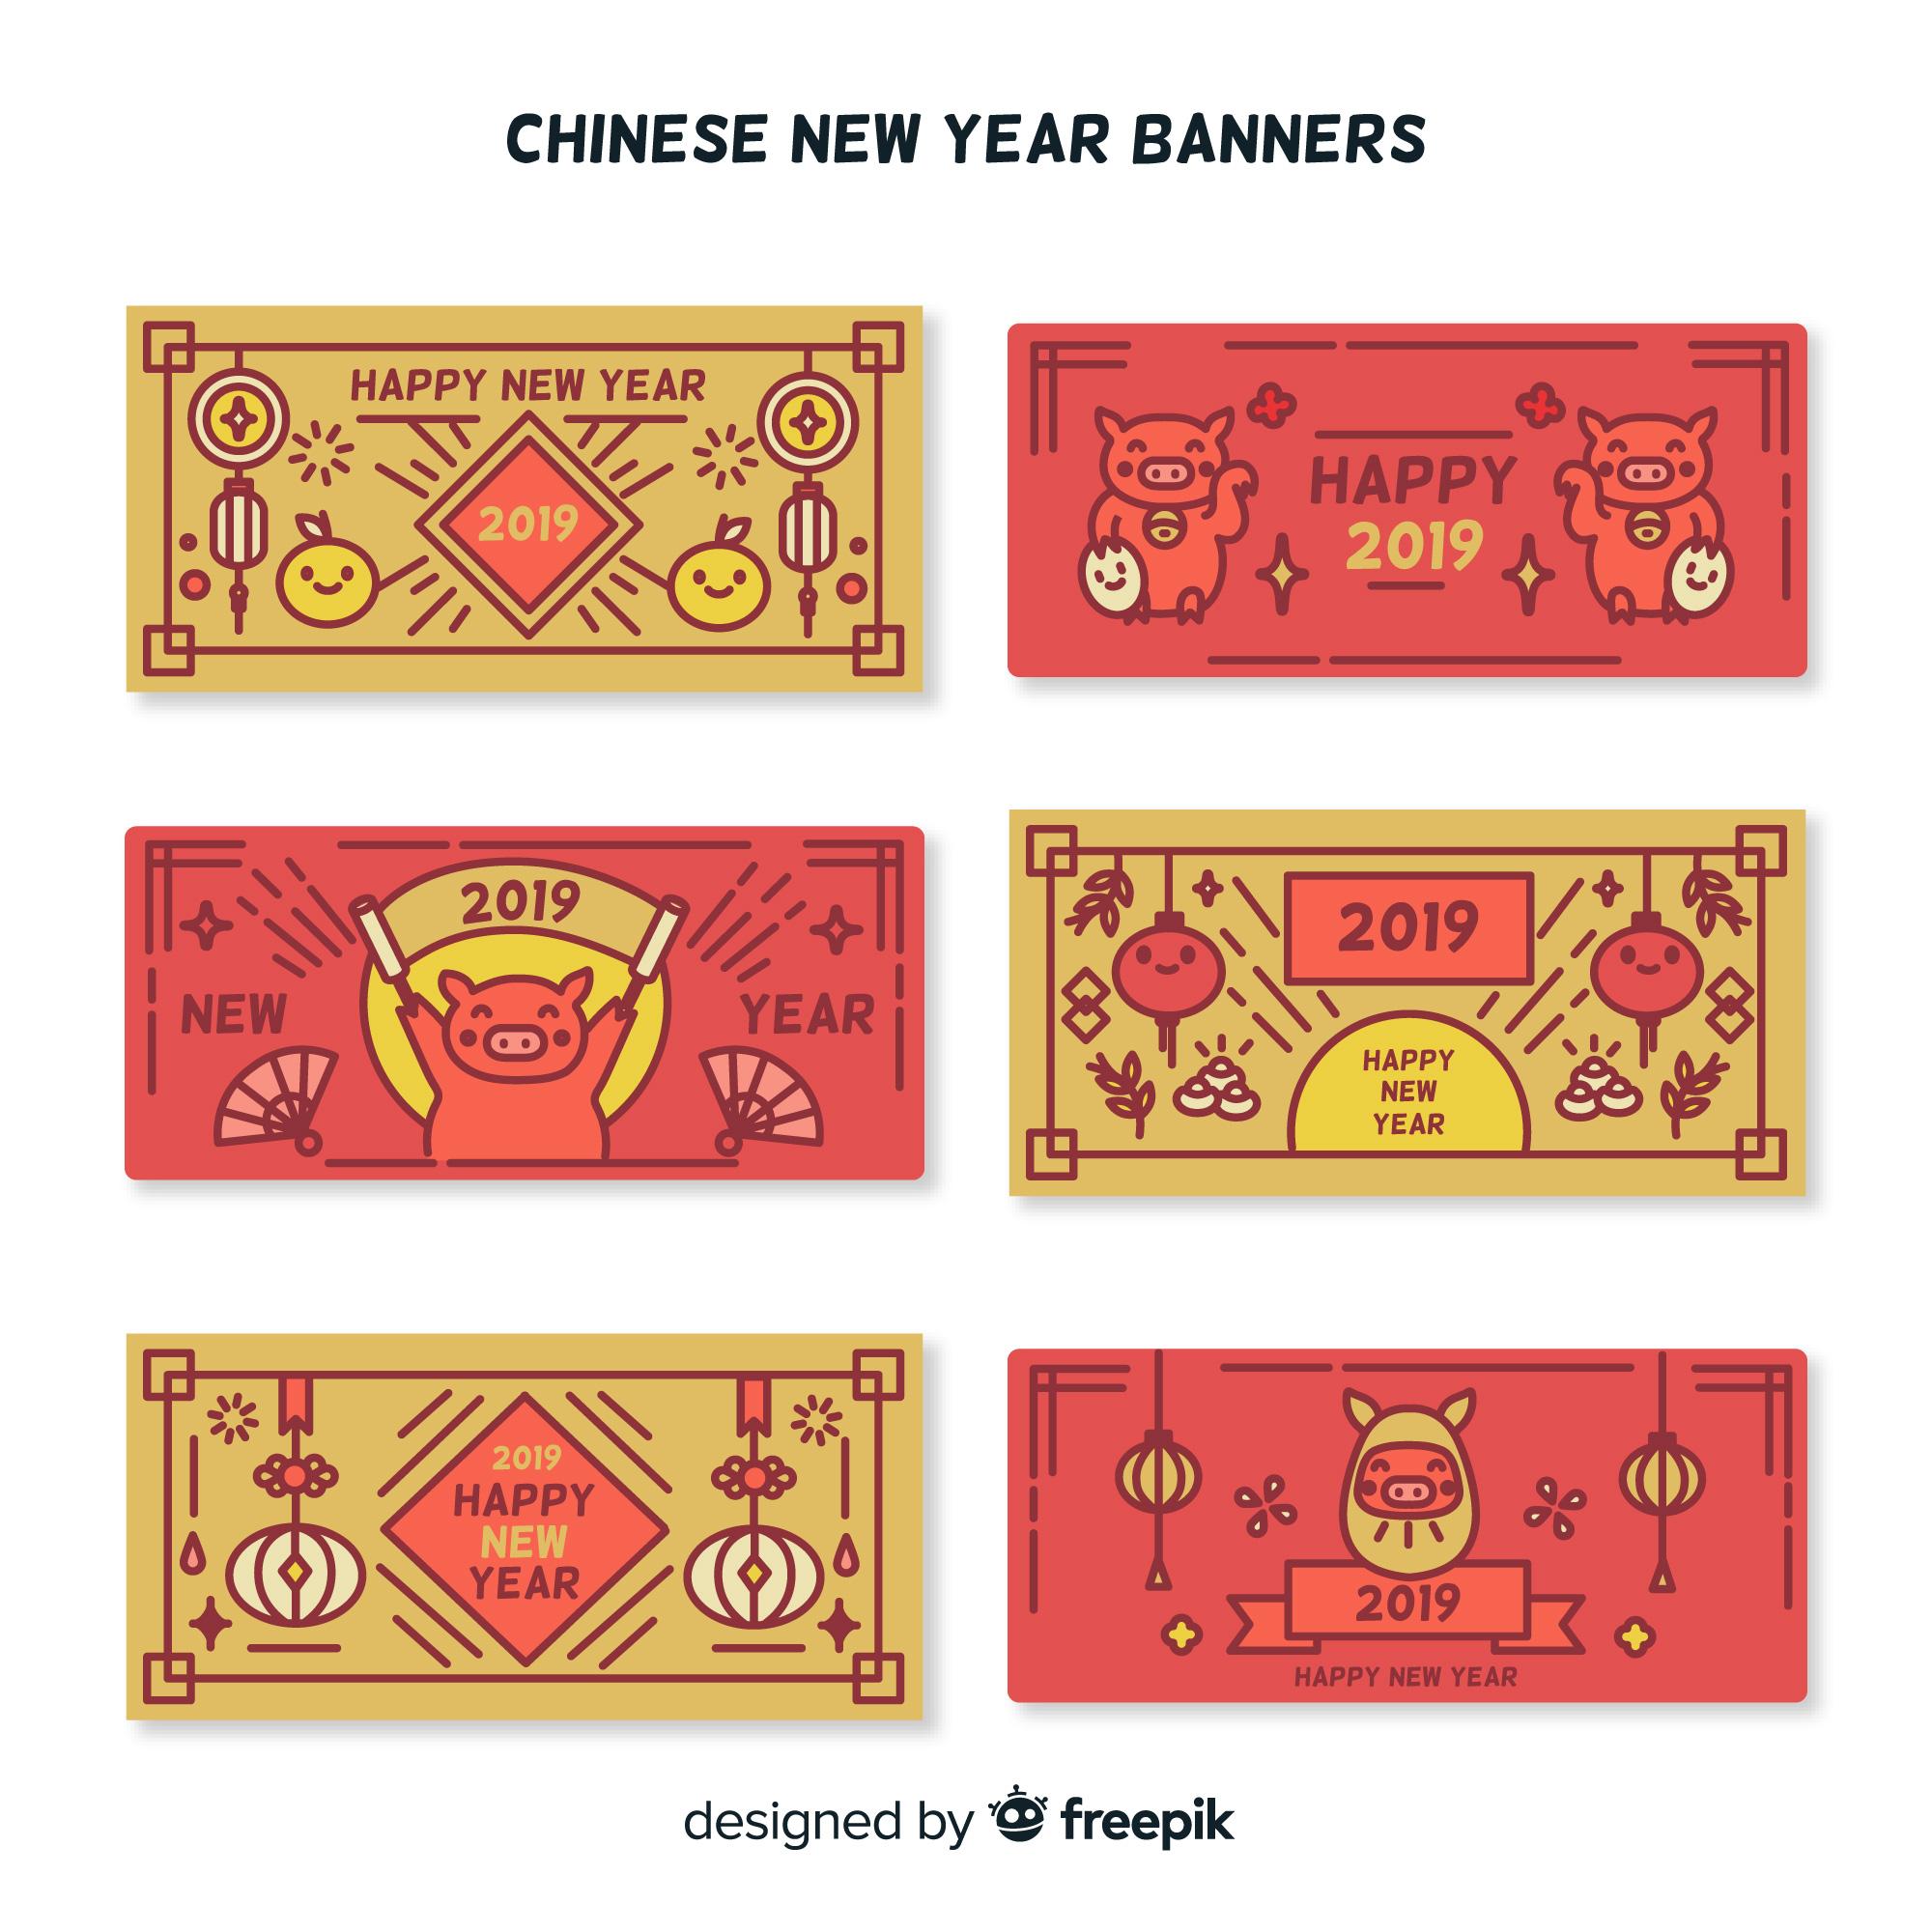 <span class='yzk_title_61902'>简约线条形式的可爱时尚高端2019猪年新年元旦海报banner设计模板</span>